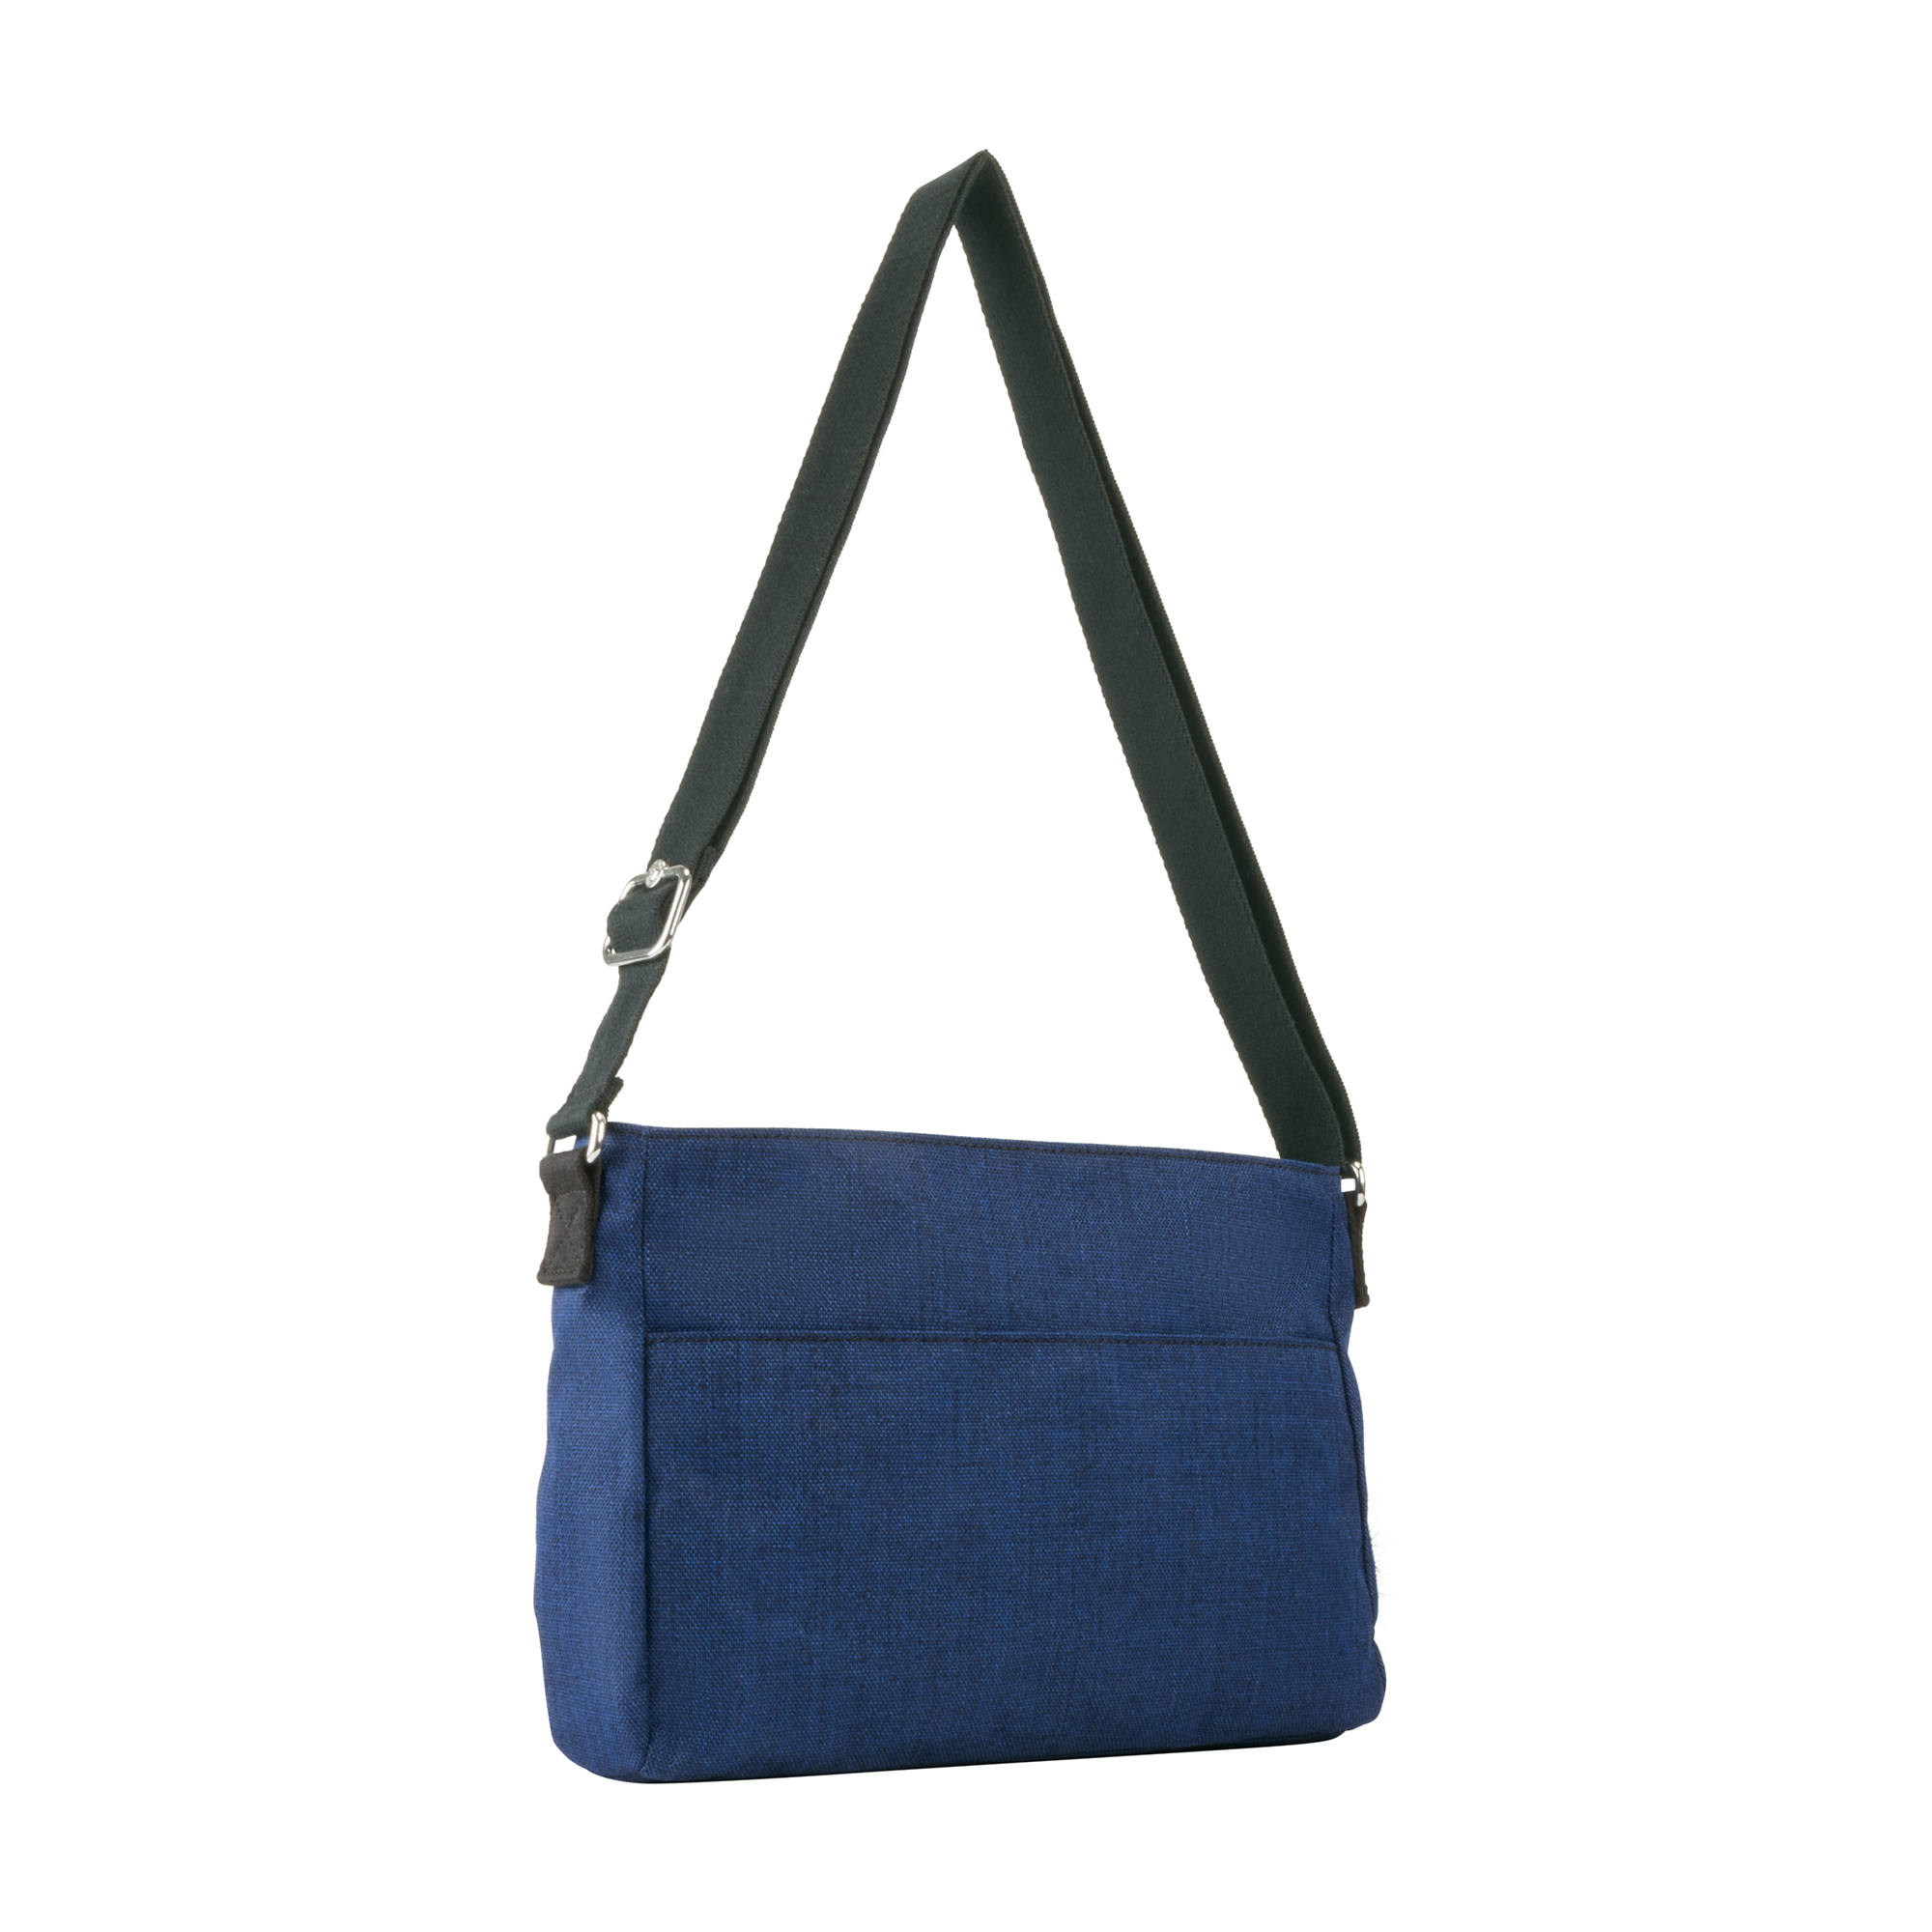 Angie Handbag Kipling